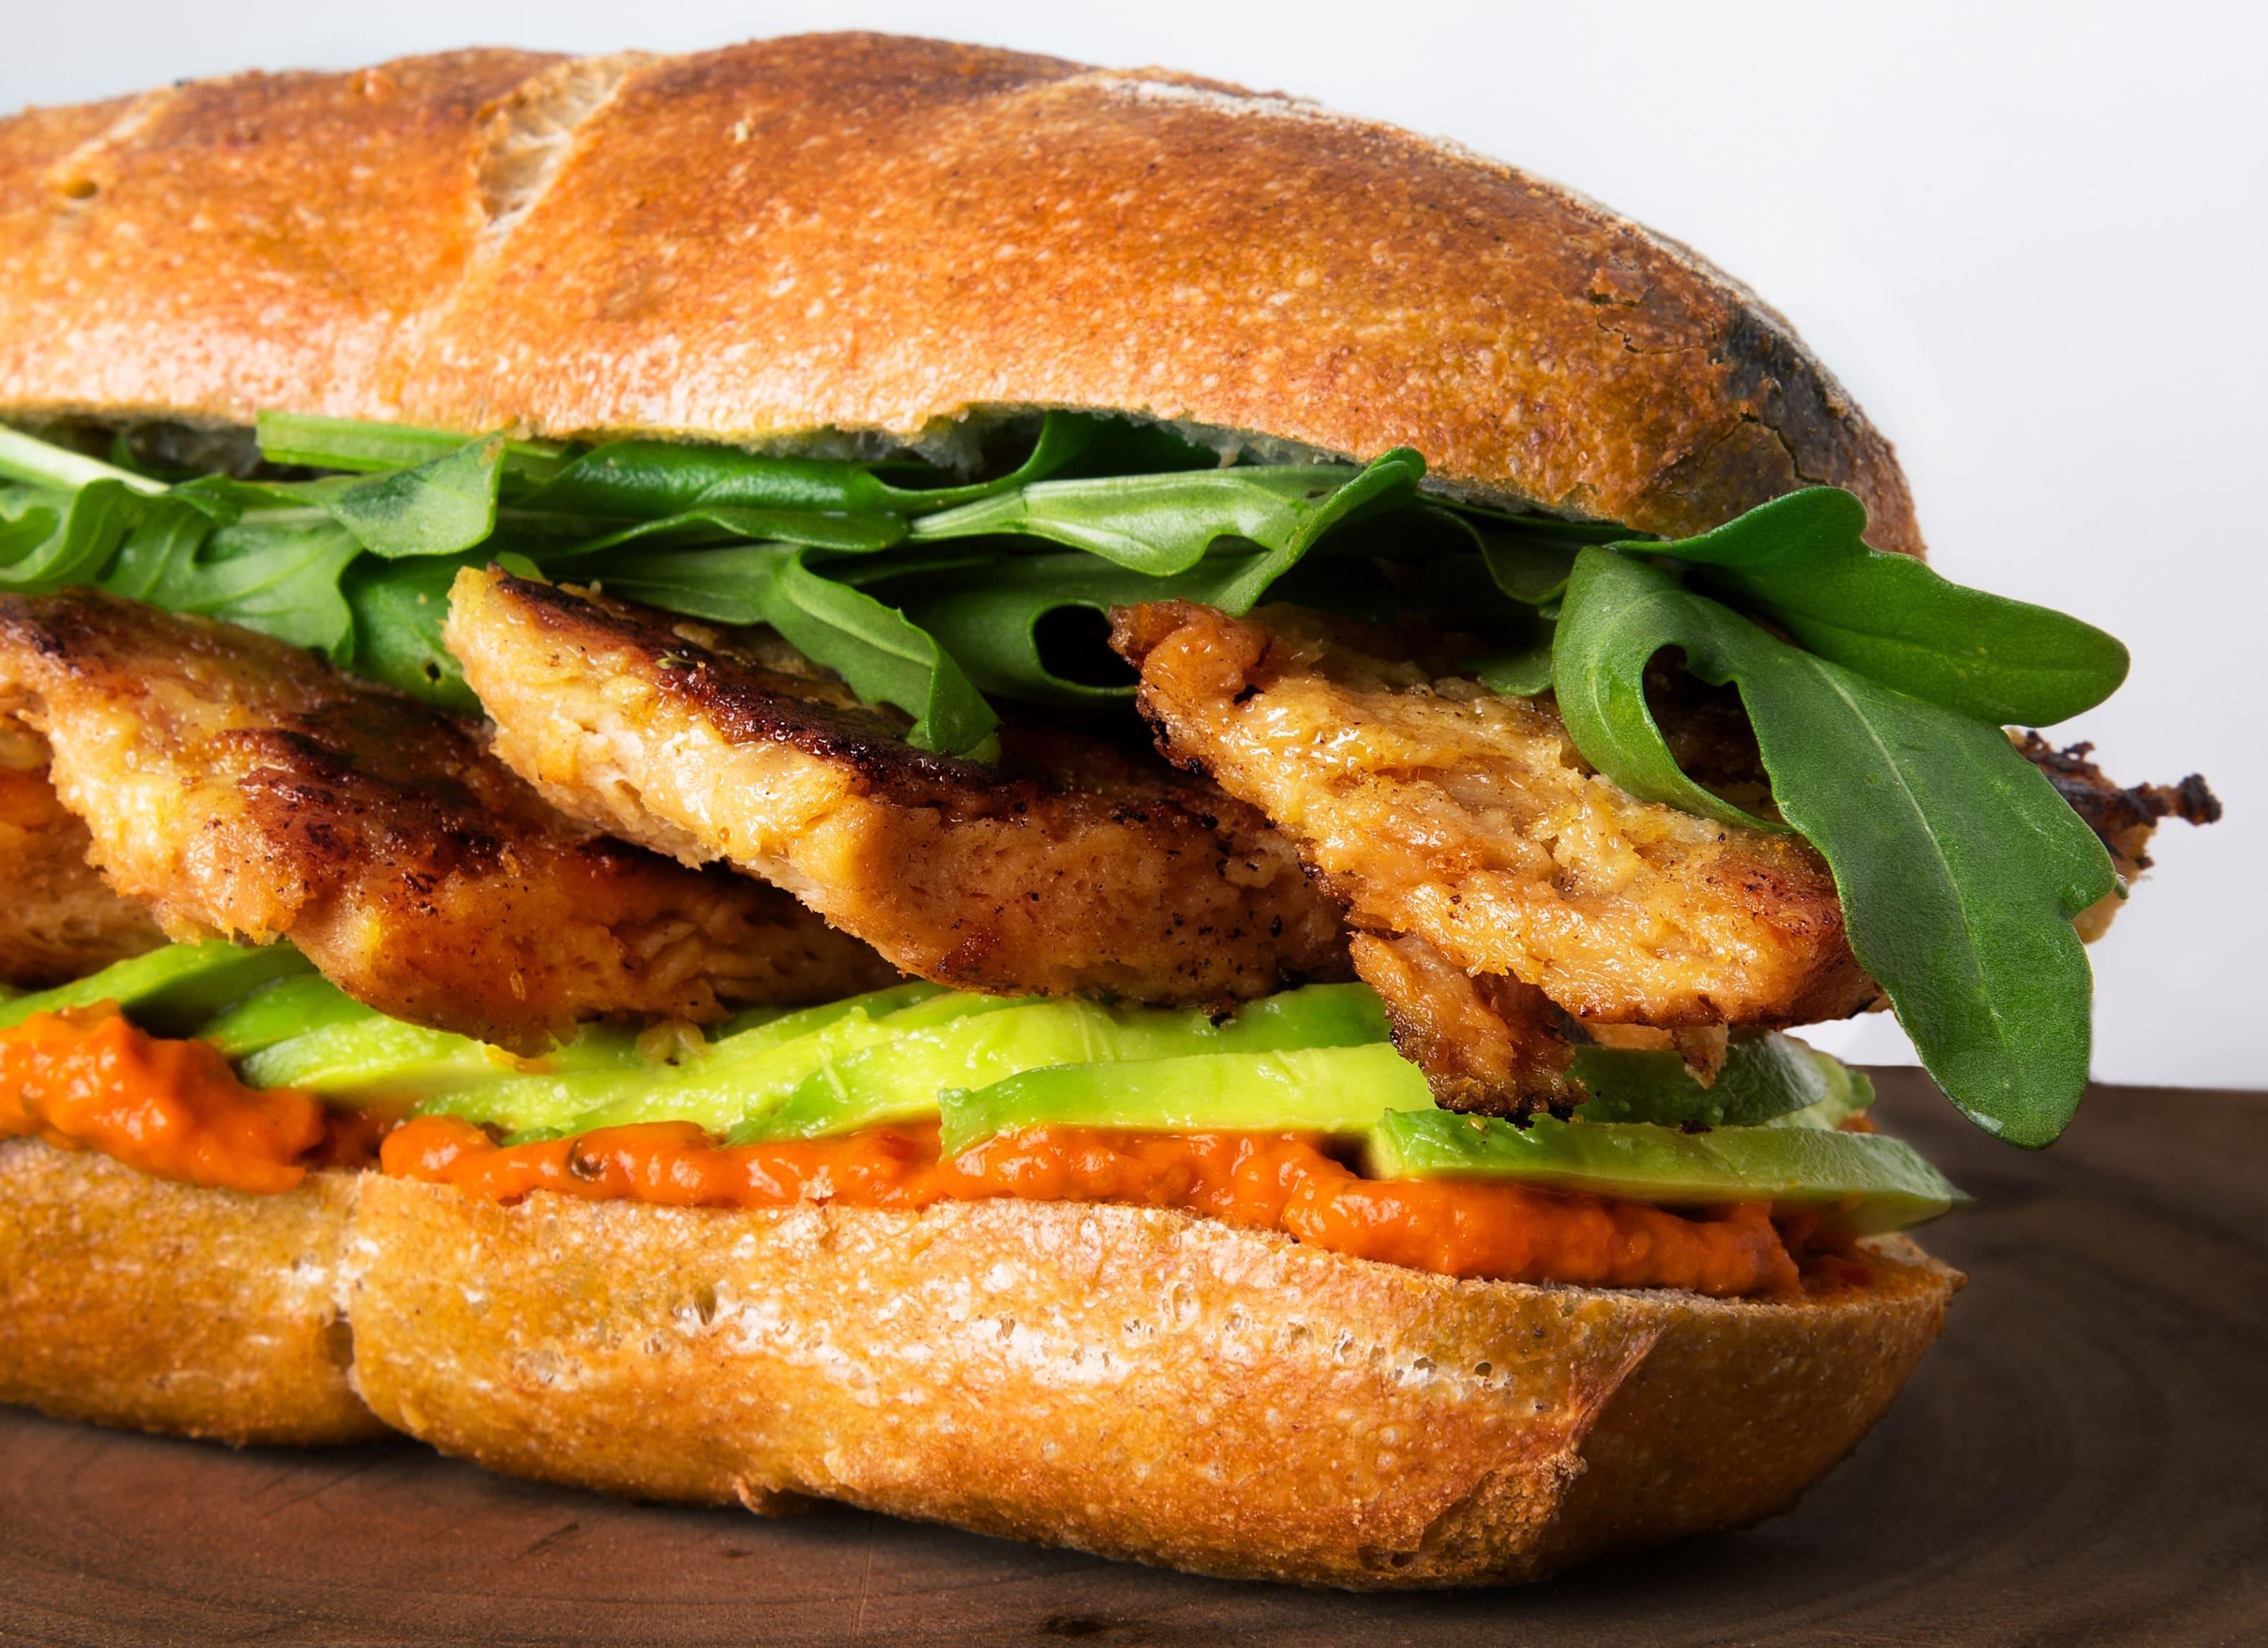 Vantastic foods Soja-Medaillons Sandwich